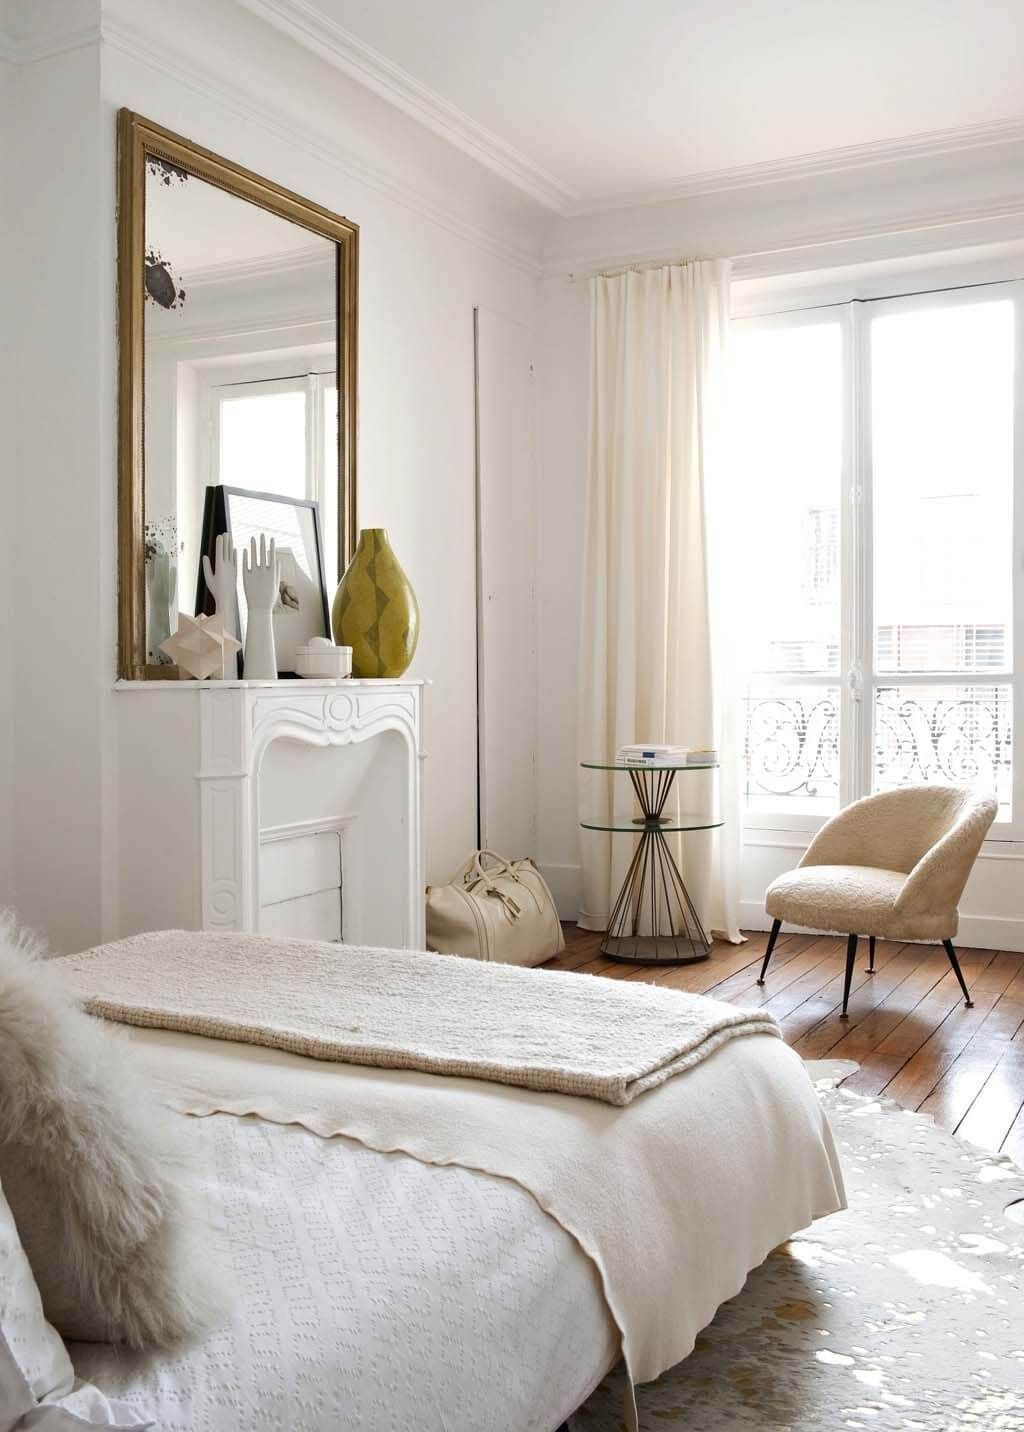 An Intro To The Parisian Art Deco Style Dormitorio Schlafzimmer